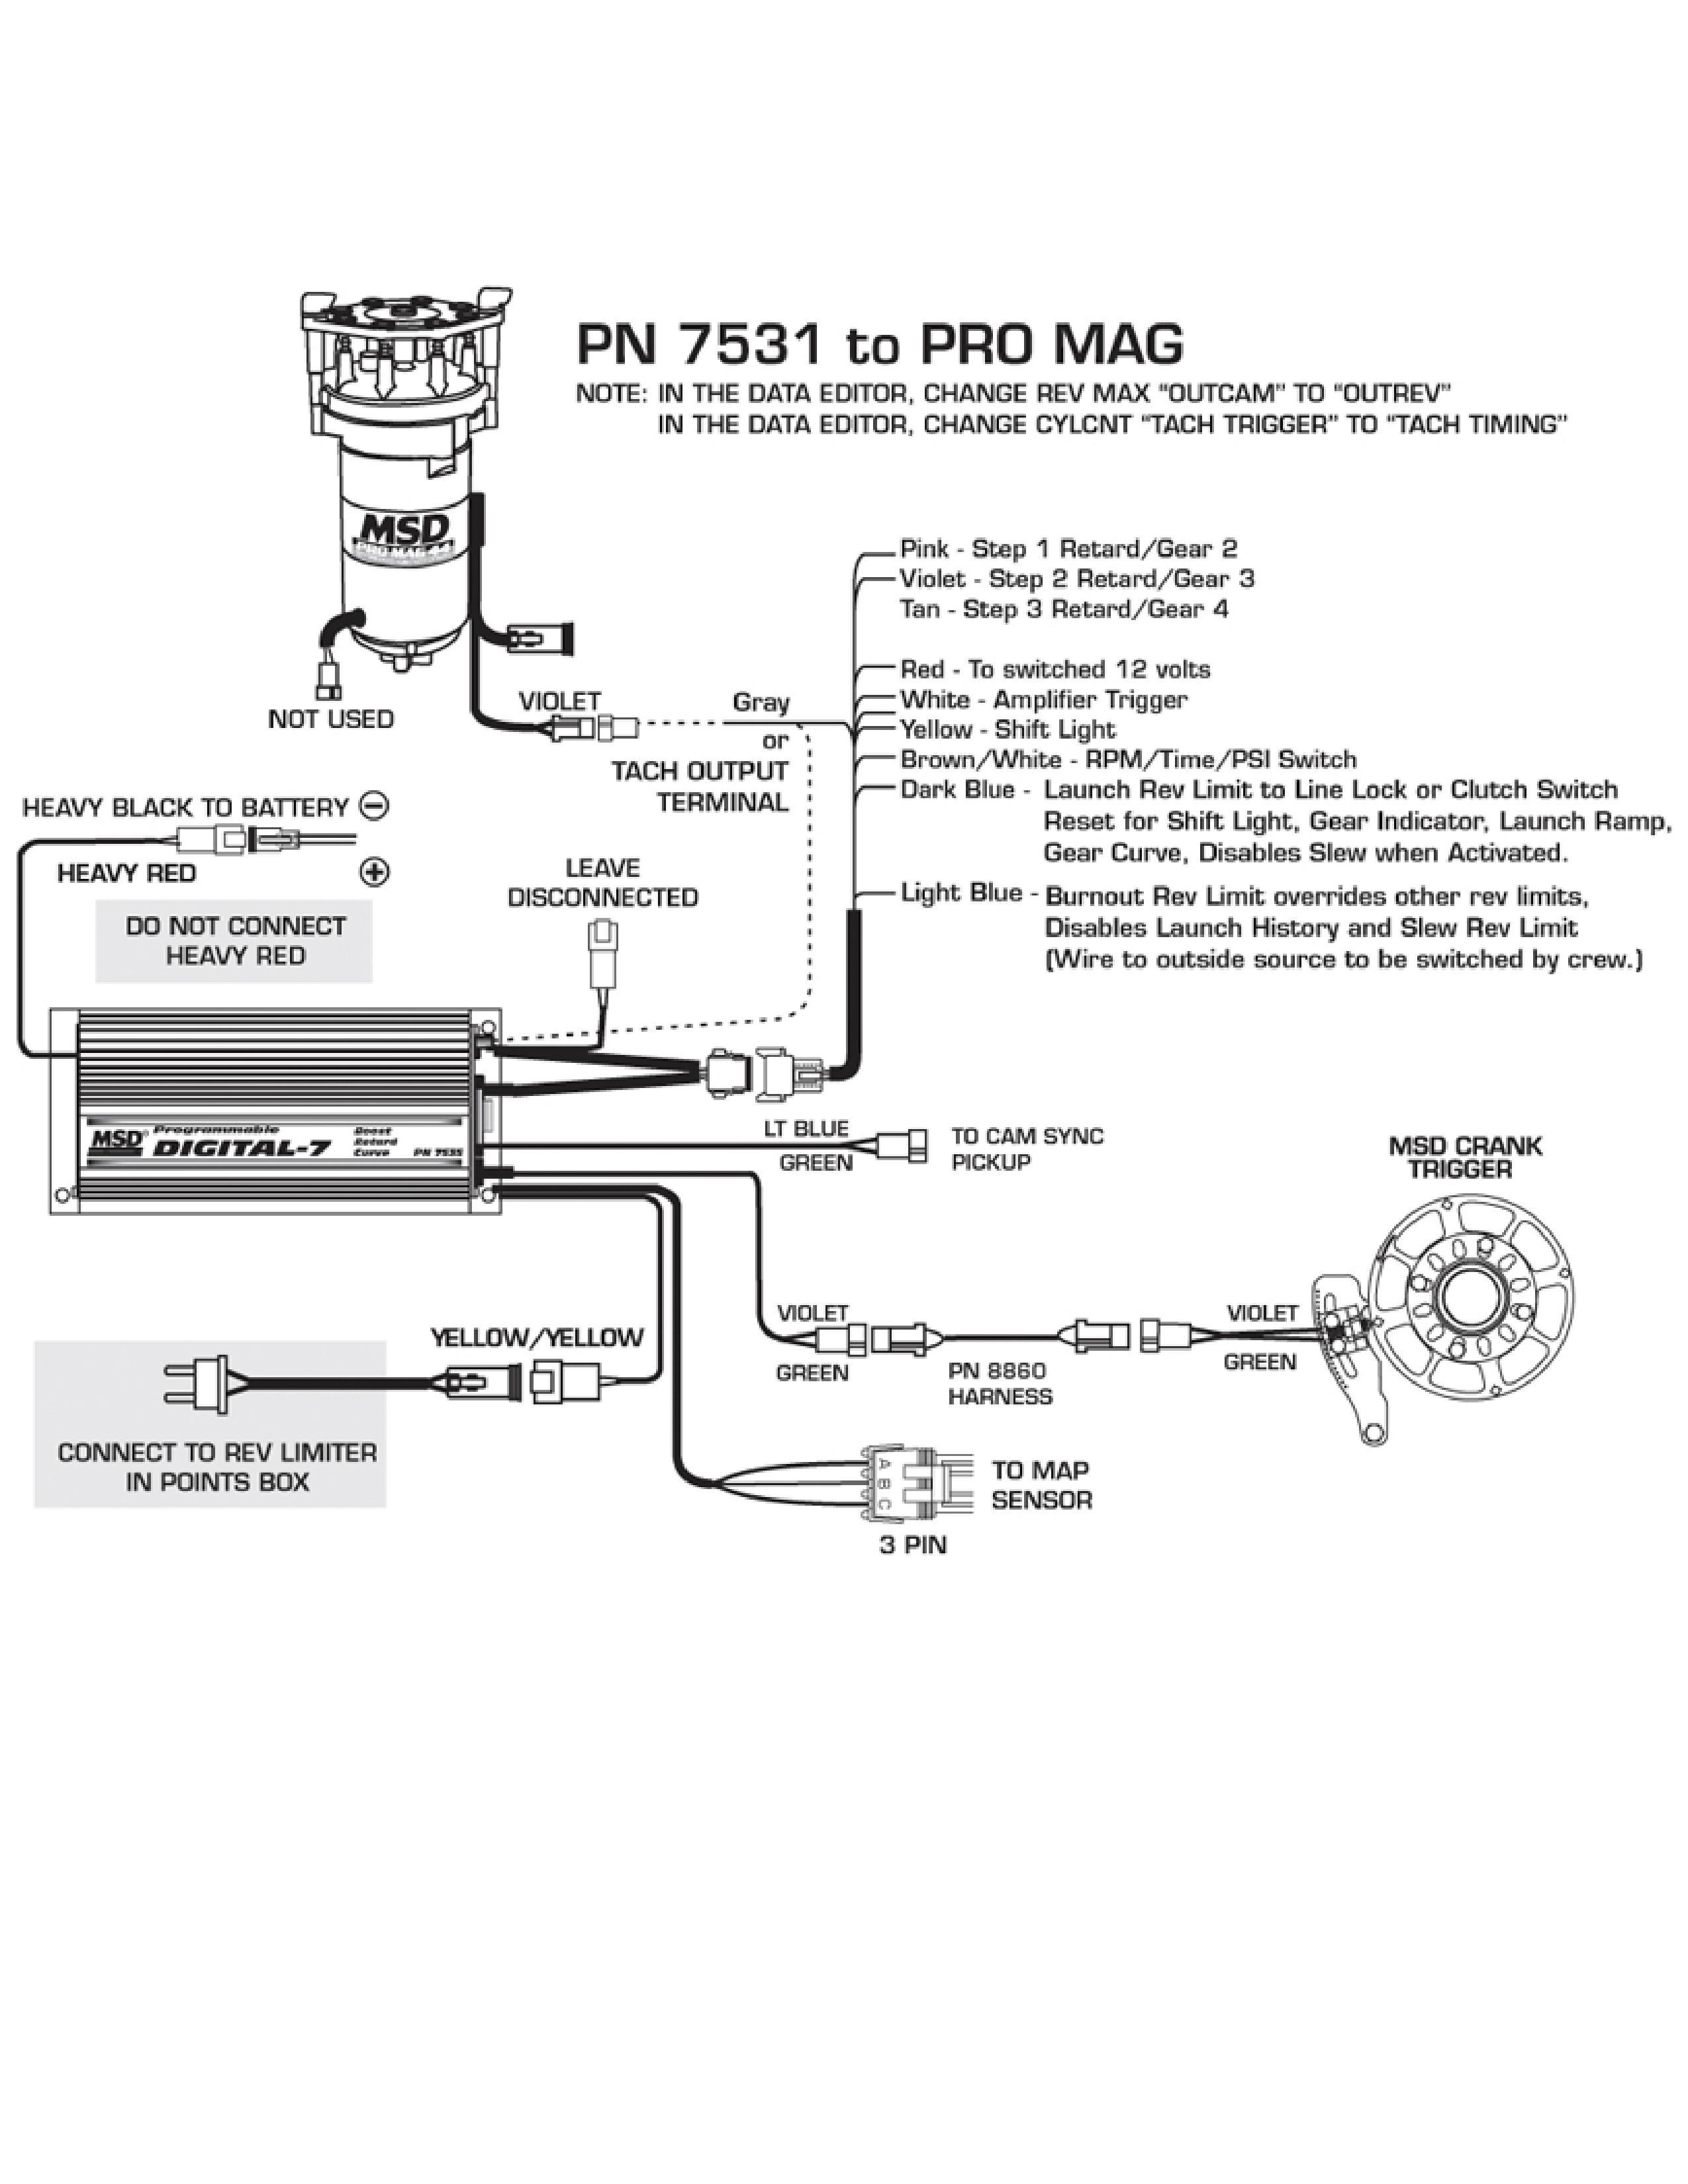 Hemi Msd Al7 Wiring Diagram Diagrams Digital 6al Ignition 7531 7 Ford 460 Distributor Box